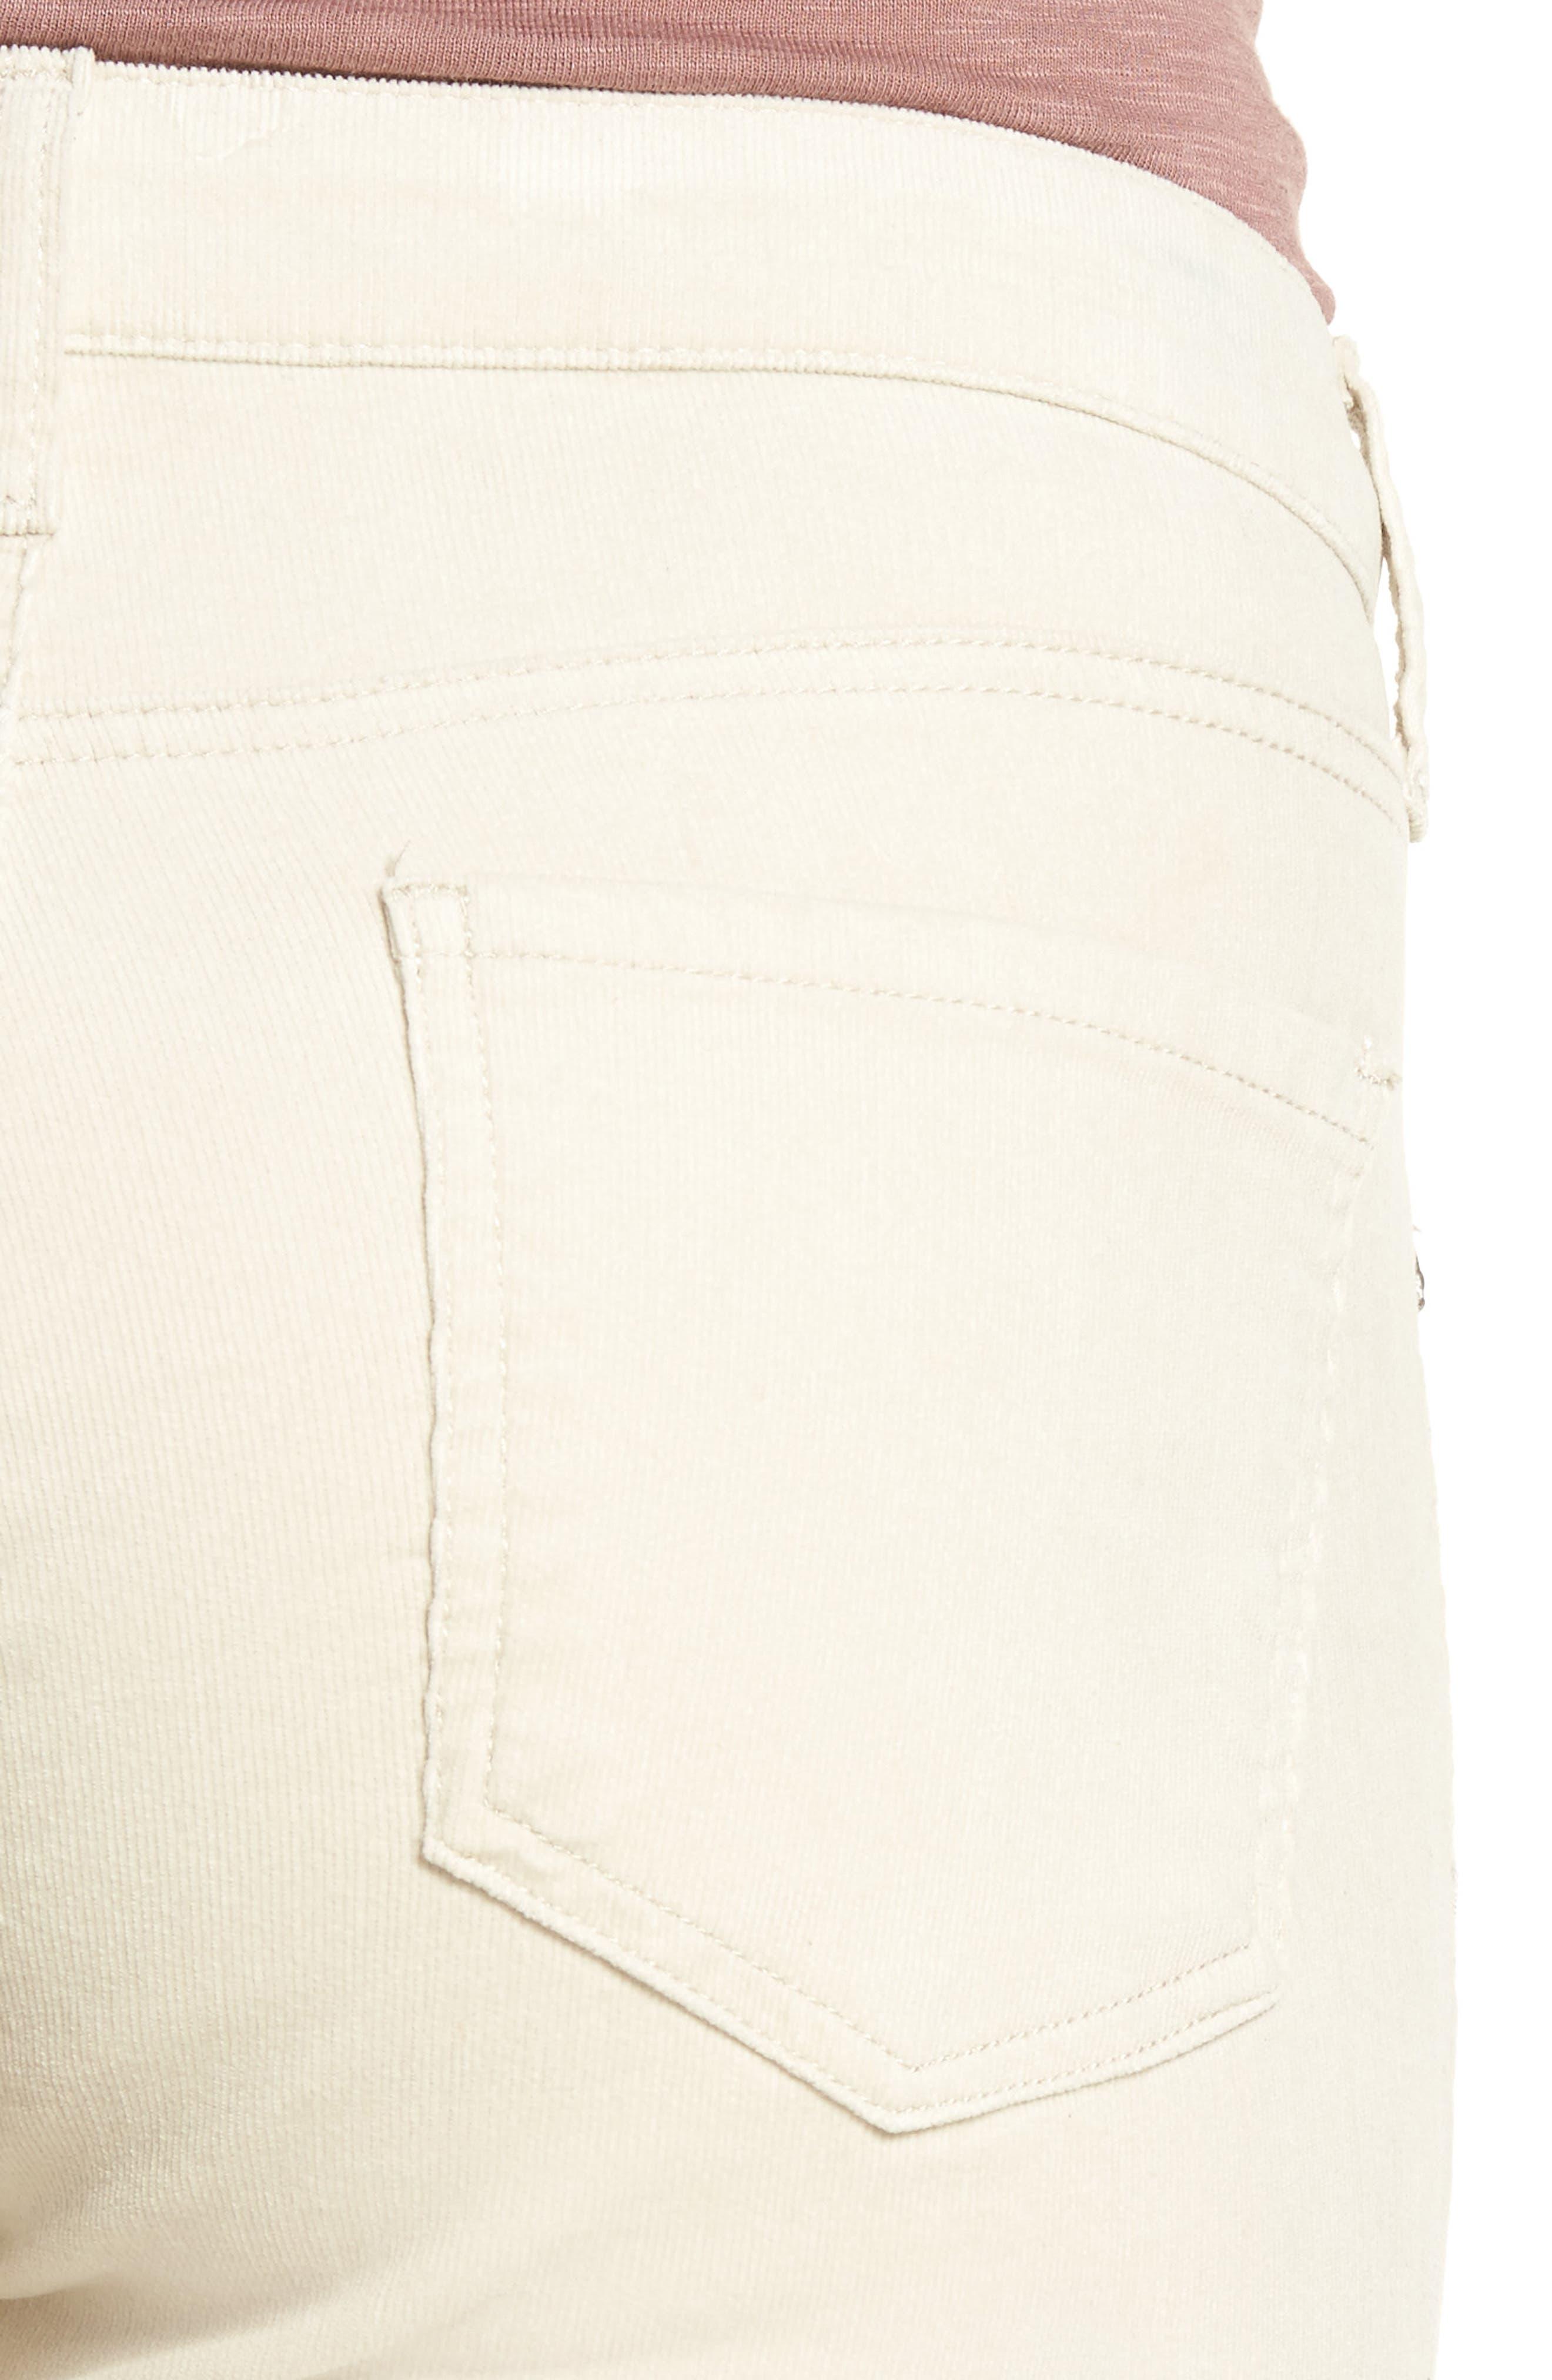 Diana Stretch Corduroy Skinny Pants,                             Alternate thumbnail 4, color,                             Light Tan 2